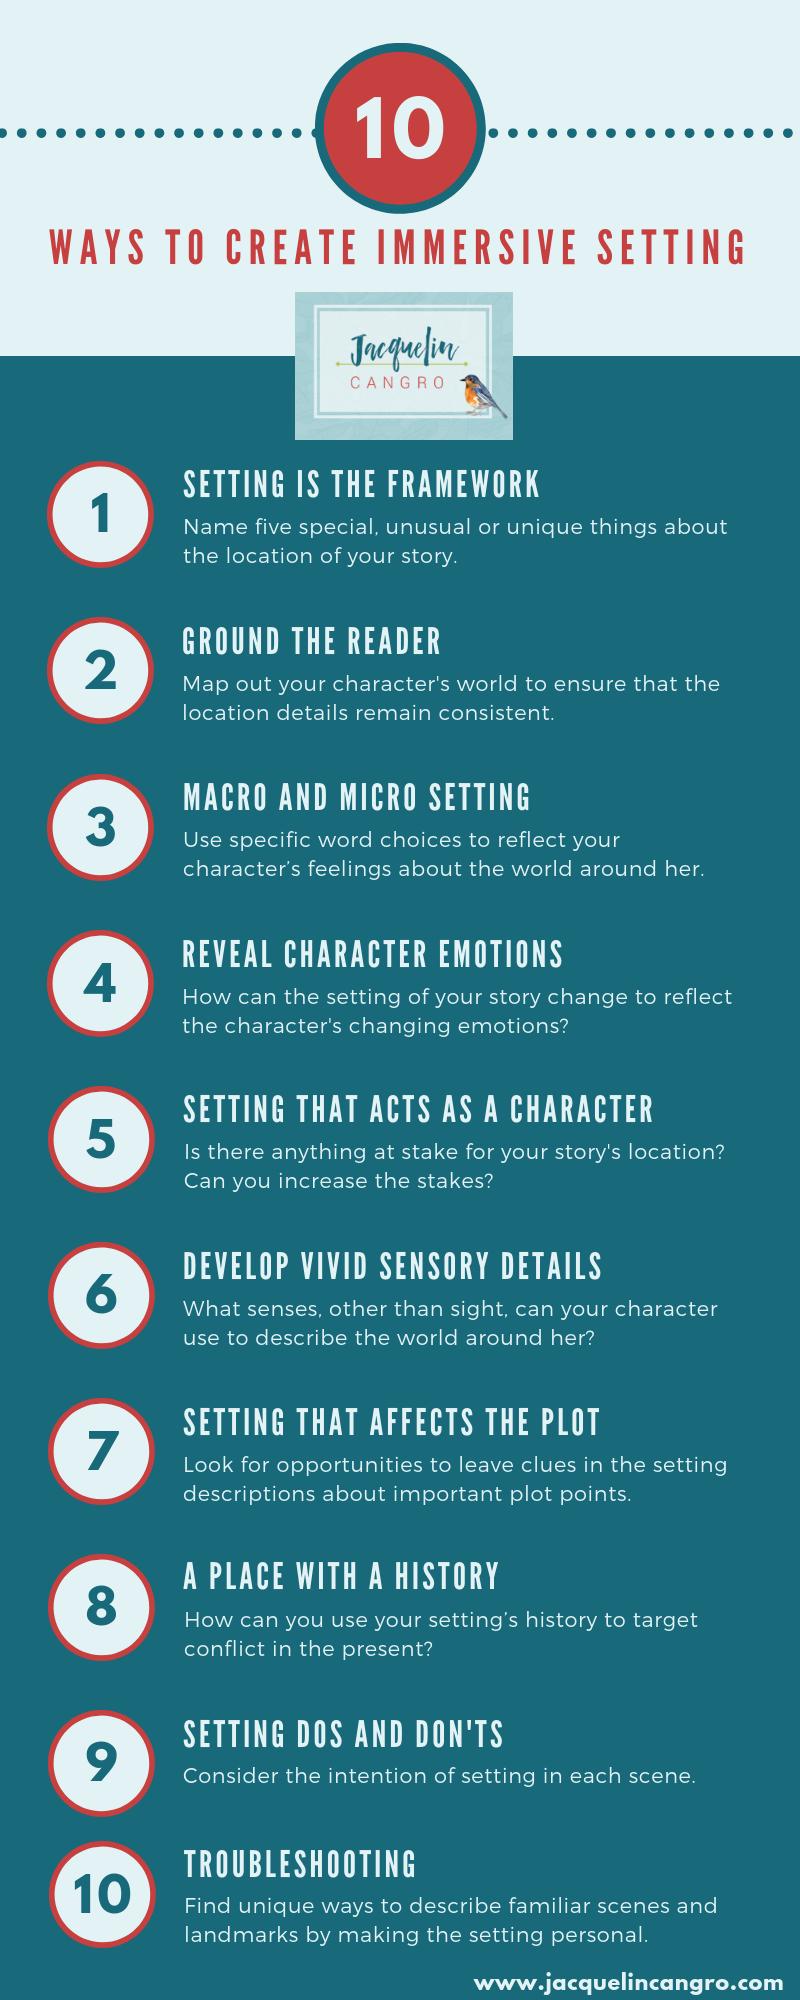 10 ways to create immersive setting